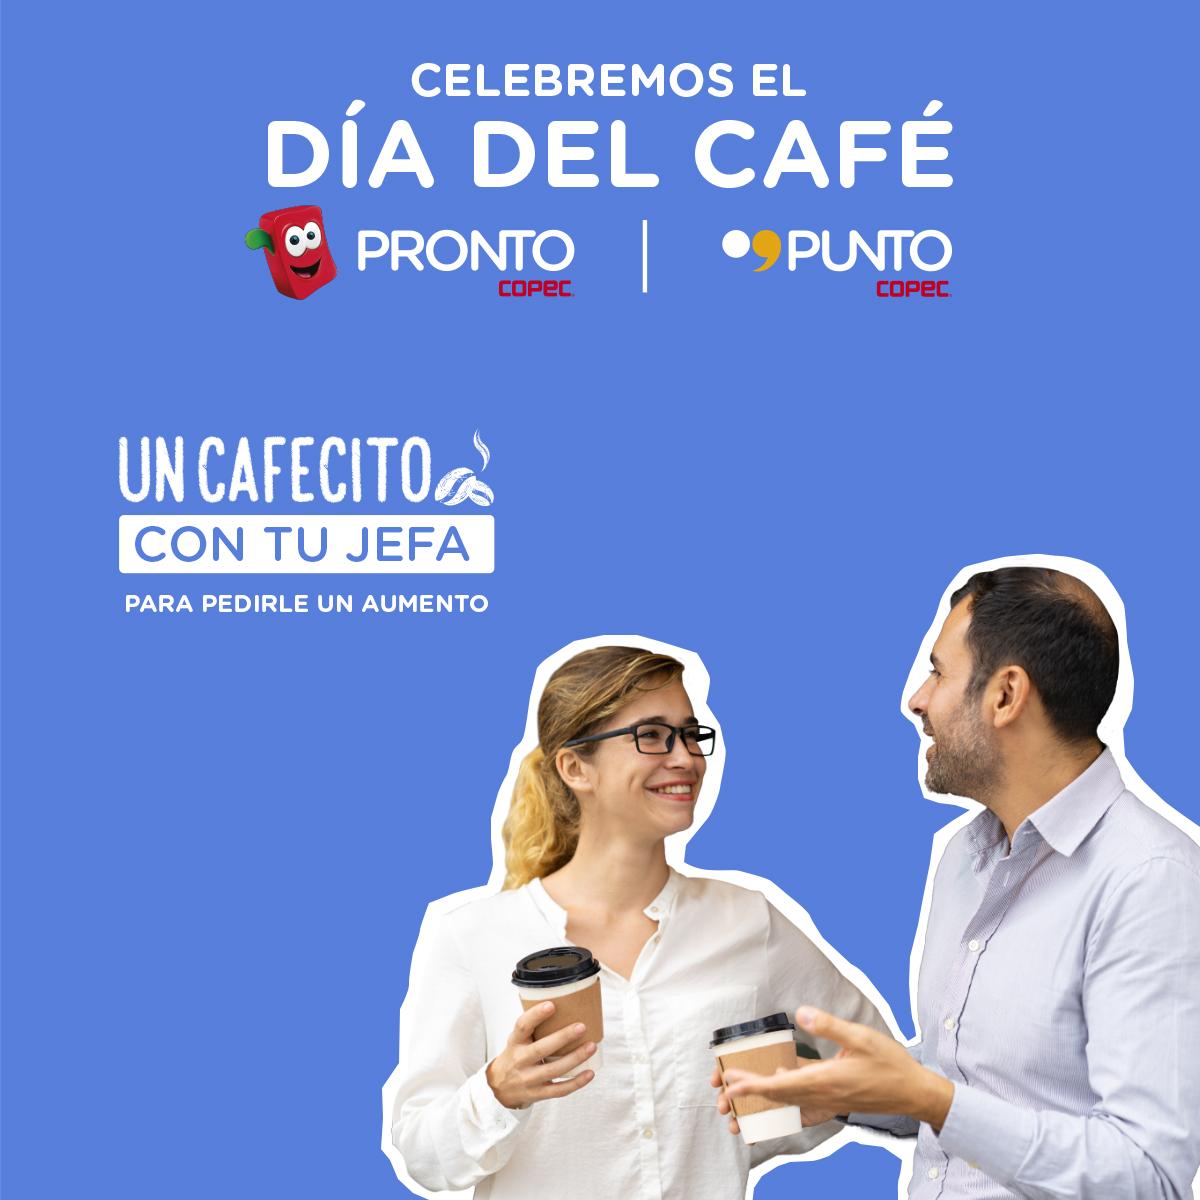 ¡GANA UN AÑO DE CAFÉ GRATIS!